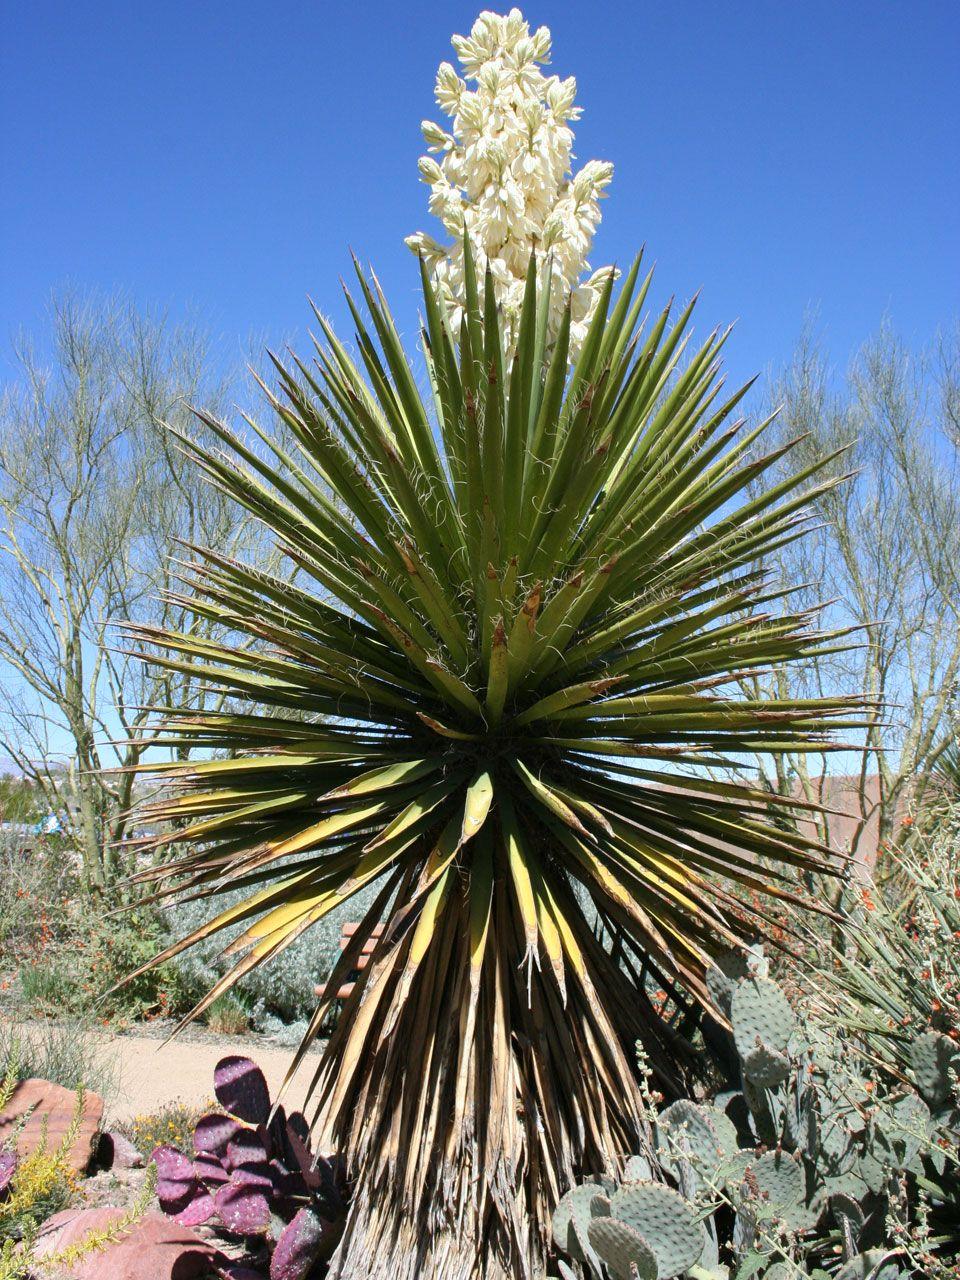 mojave yucca drought tolerant plants yucca plant plants desert plants. Black Bedroom Furniture Sets. Home Design Ideas